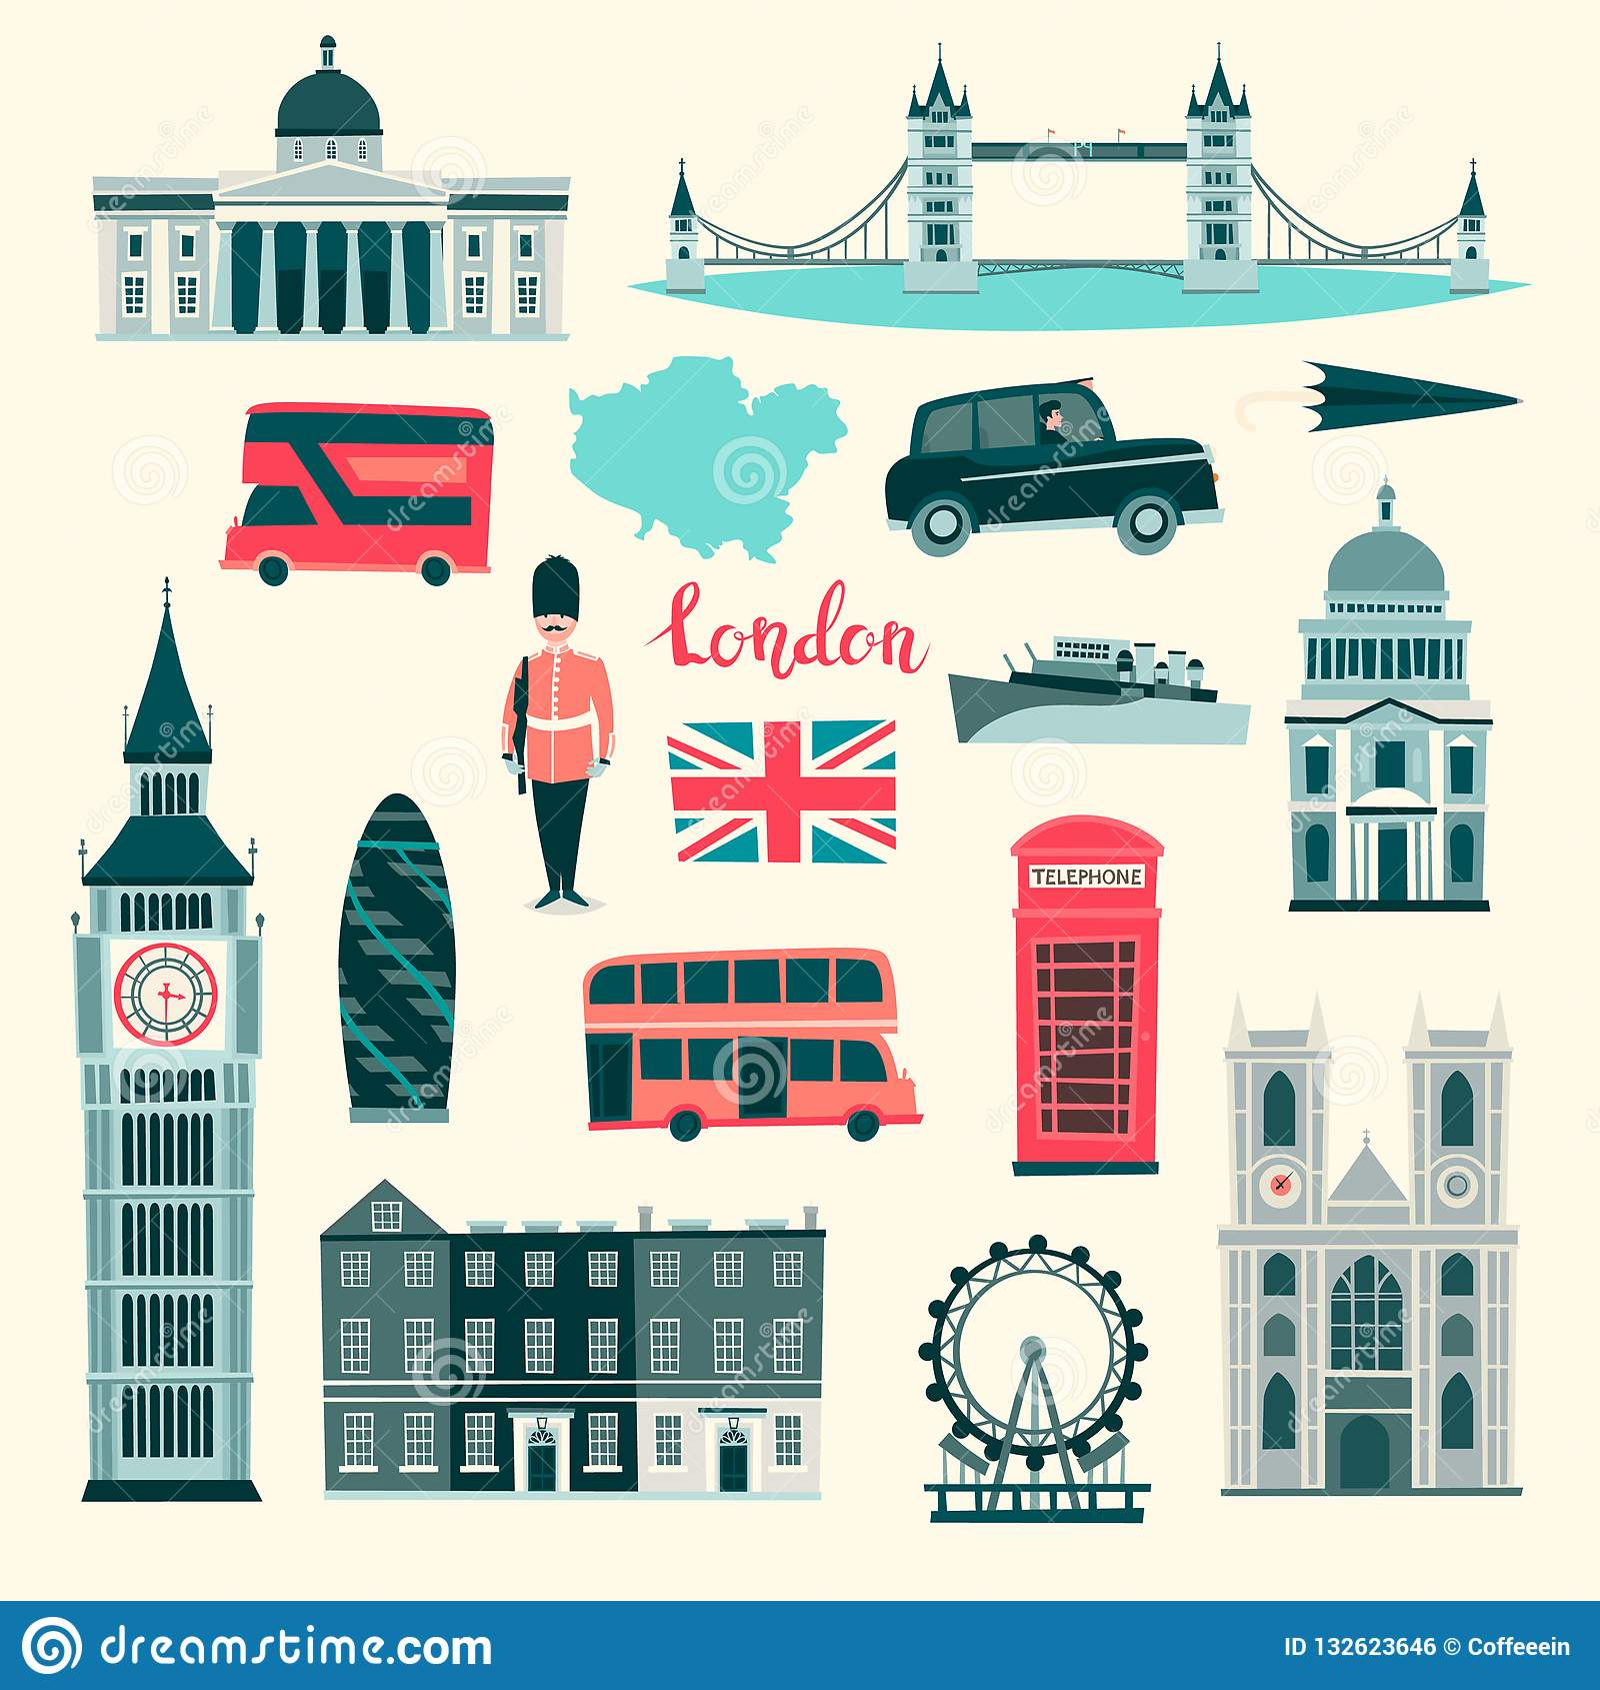 London Vector Illustration Set Cartoon United Kingdom Icons London